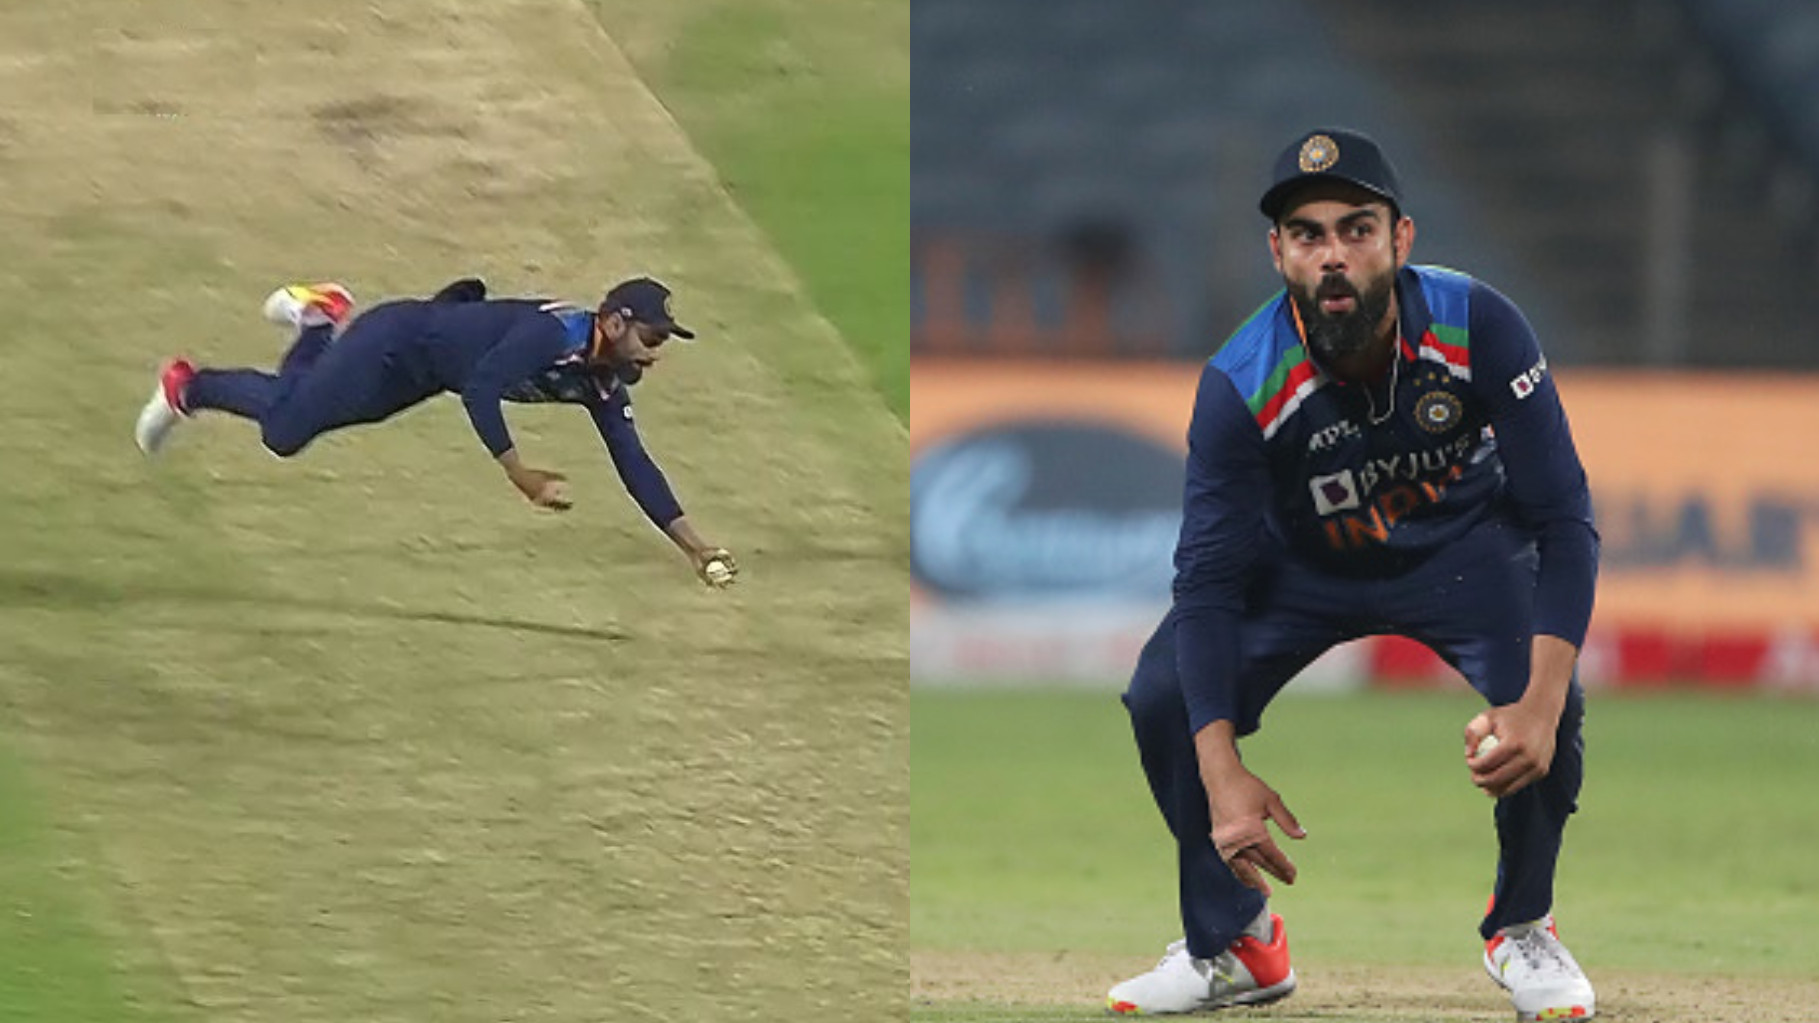 IND v ENG 2021: WATCH- Virat Kohli takes a brilliant one-handed cruncher to remove Adil Rashid in 3rd ODI